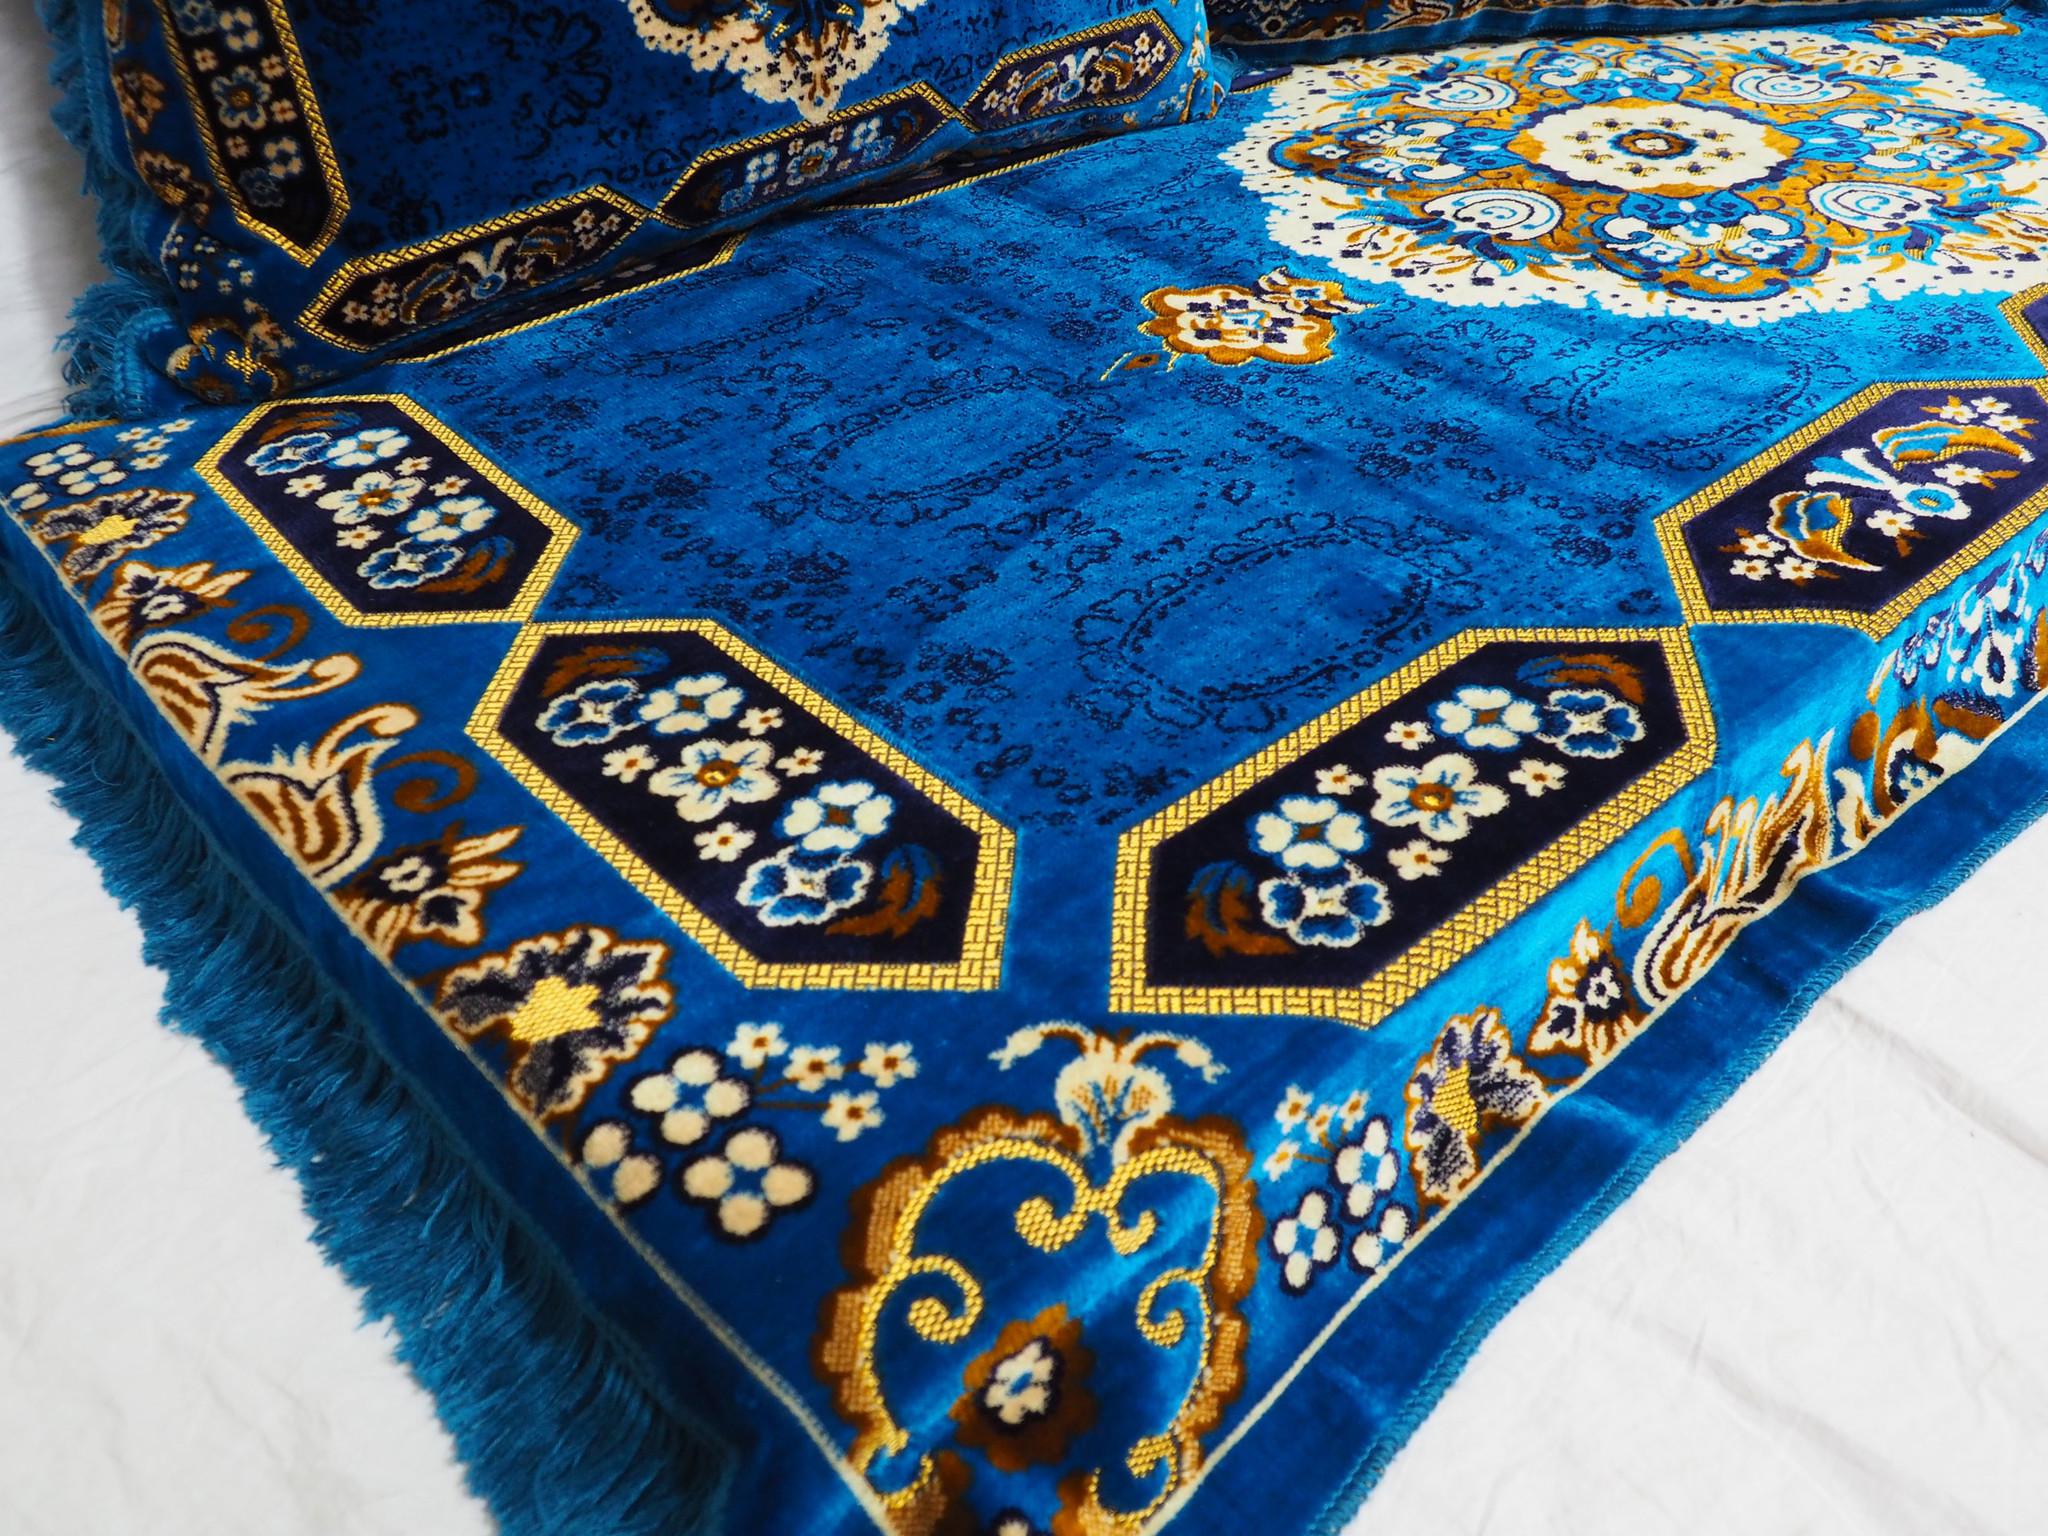 Set of 3 Pcs  1x Mattress  + 2x cushions orient Afghan nomad pillow rug seat floor cushion 1001-night Seating  majlis Toshak توشک